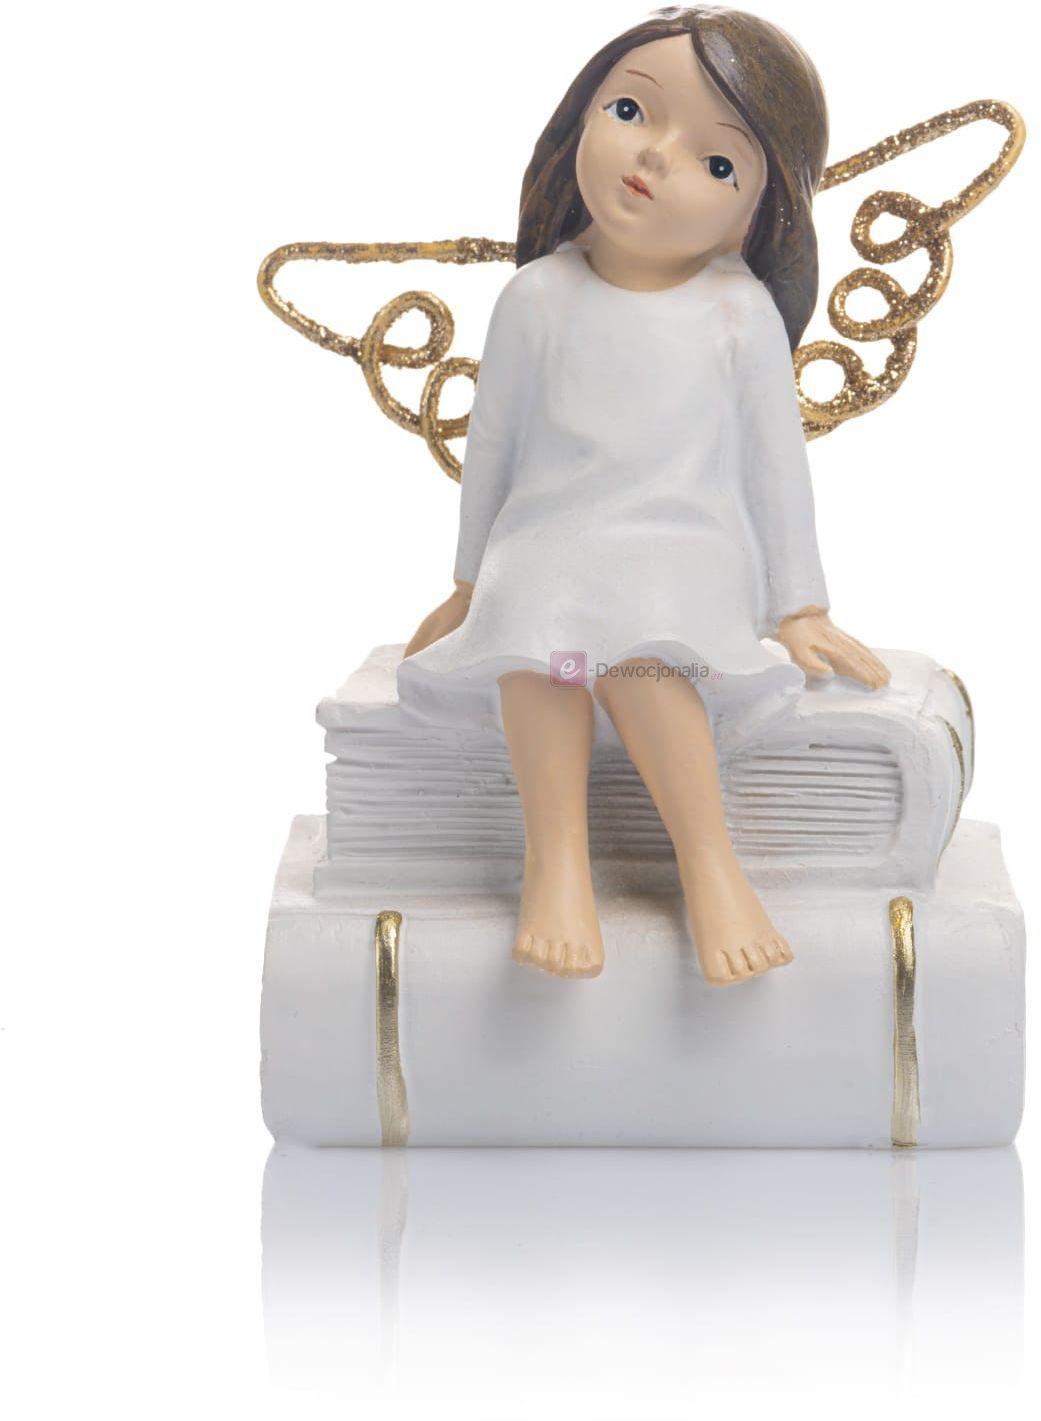 Figurka - aniołek - książka - 12 cm